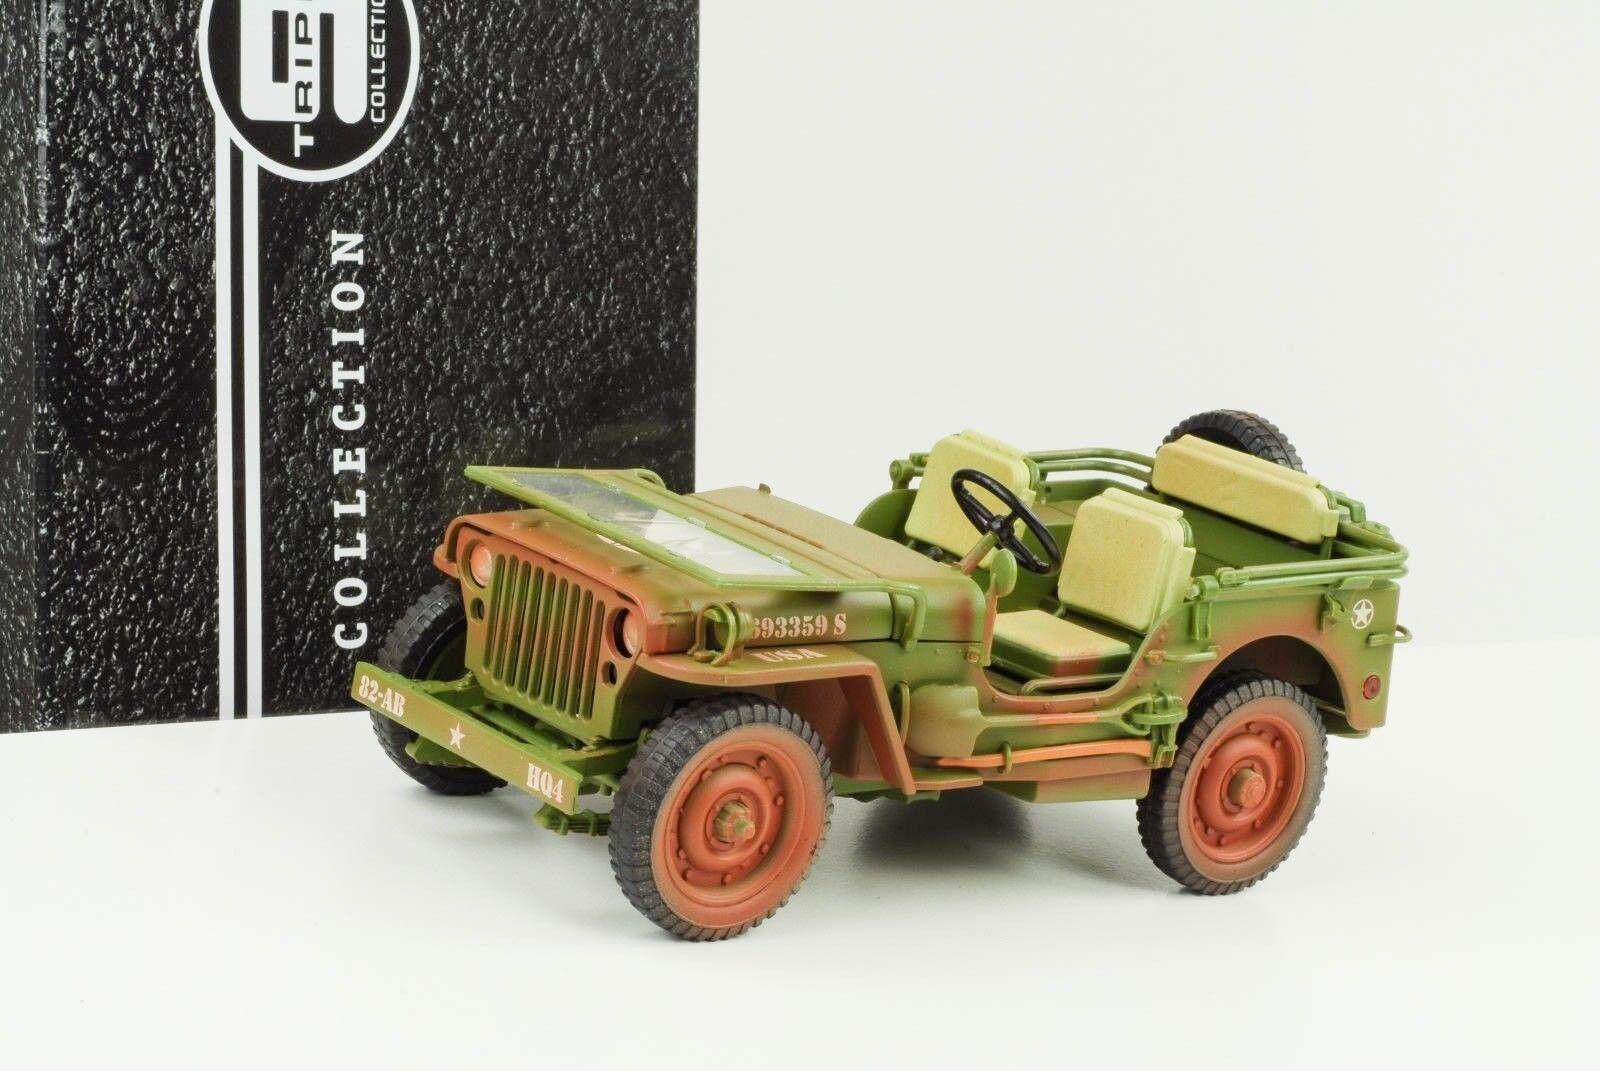 1942 Jeep Willys Us Army Rough Terrain Muddy Green 1 18 Tripple9